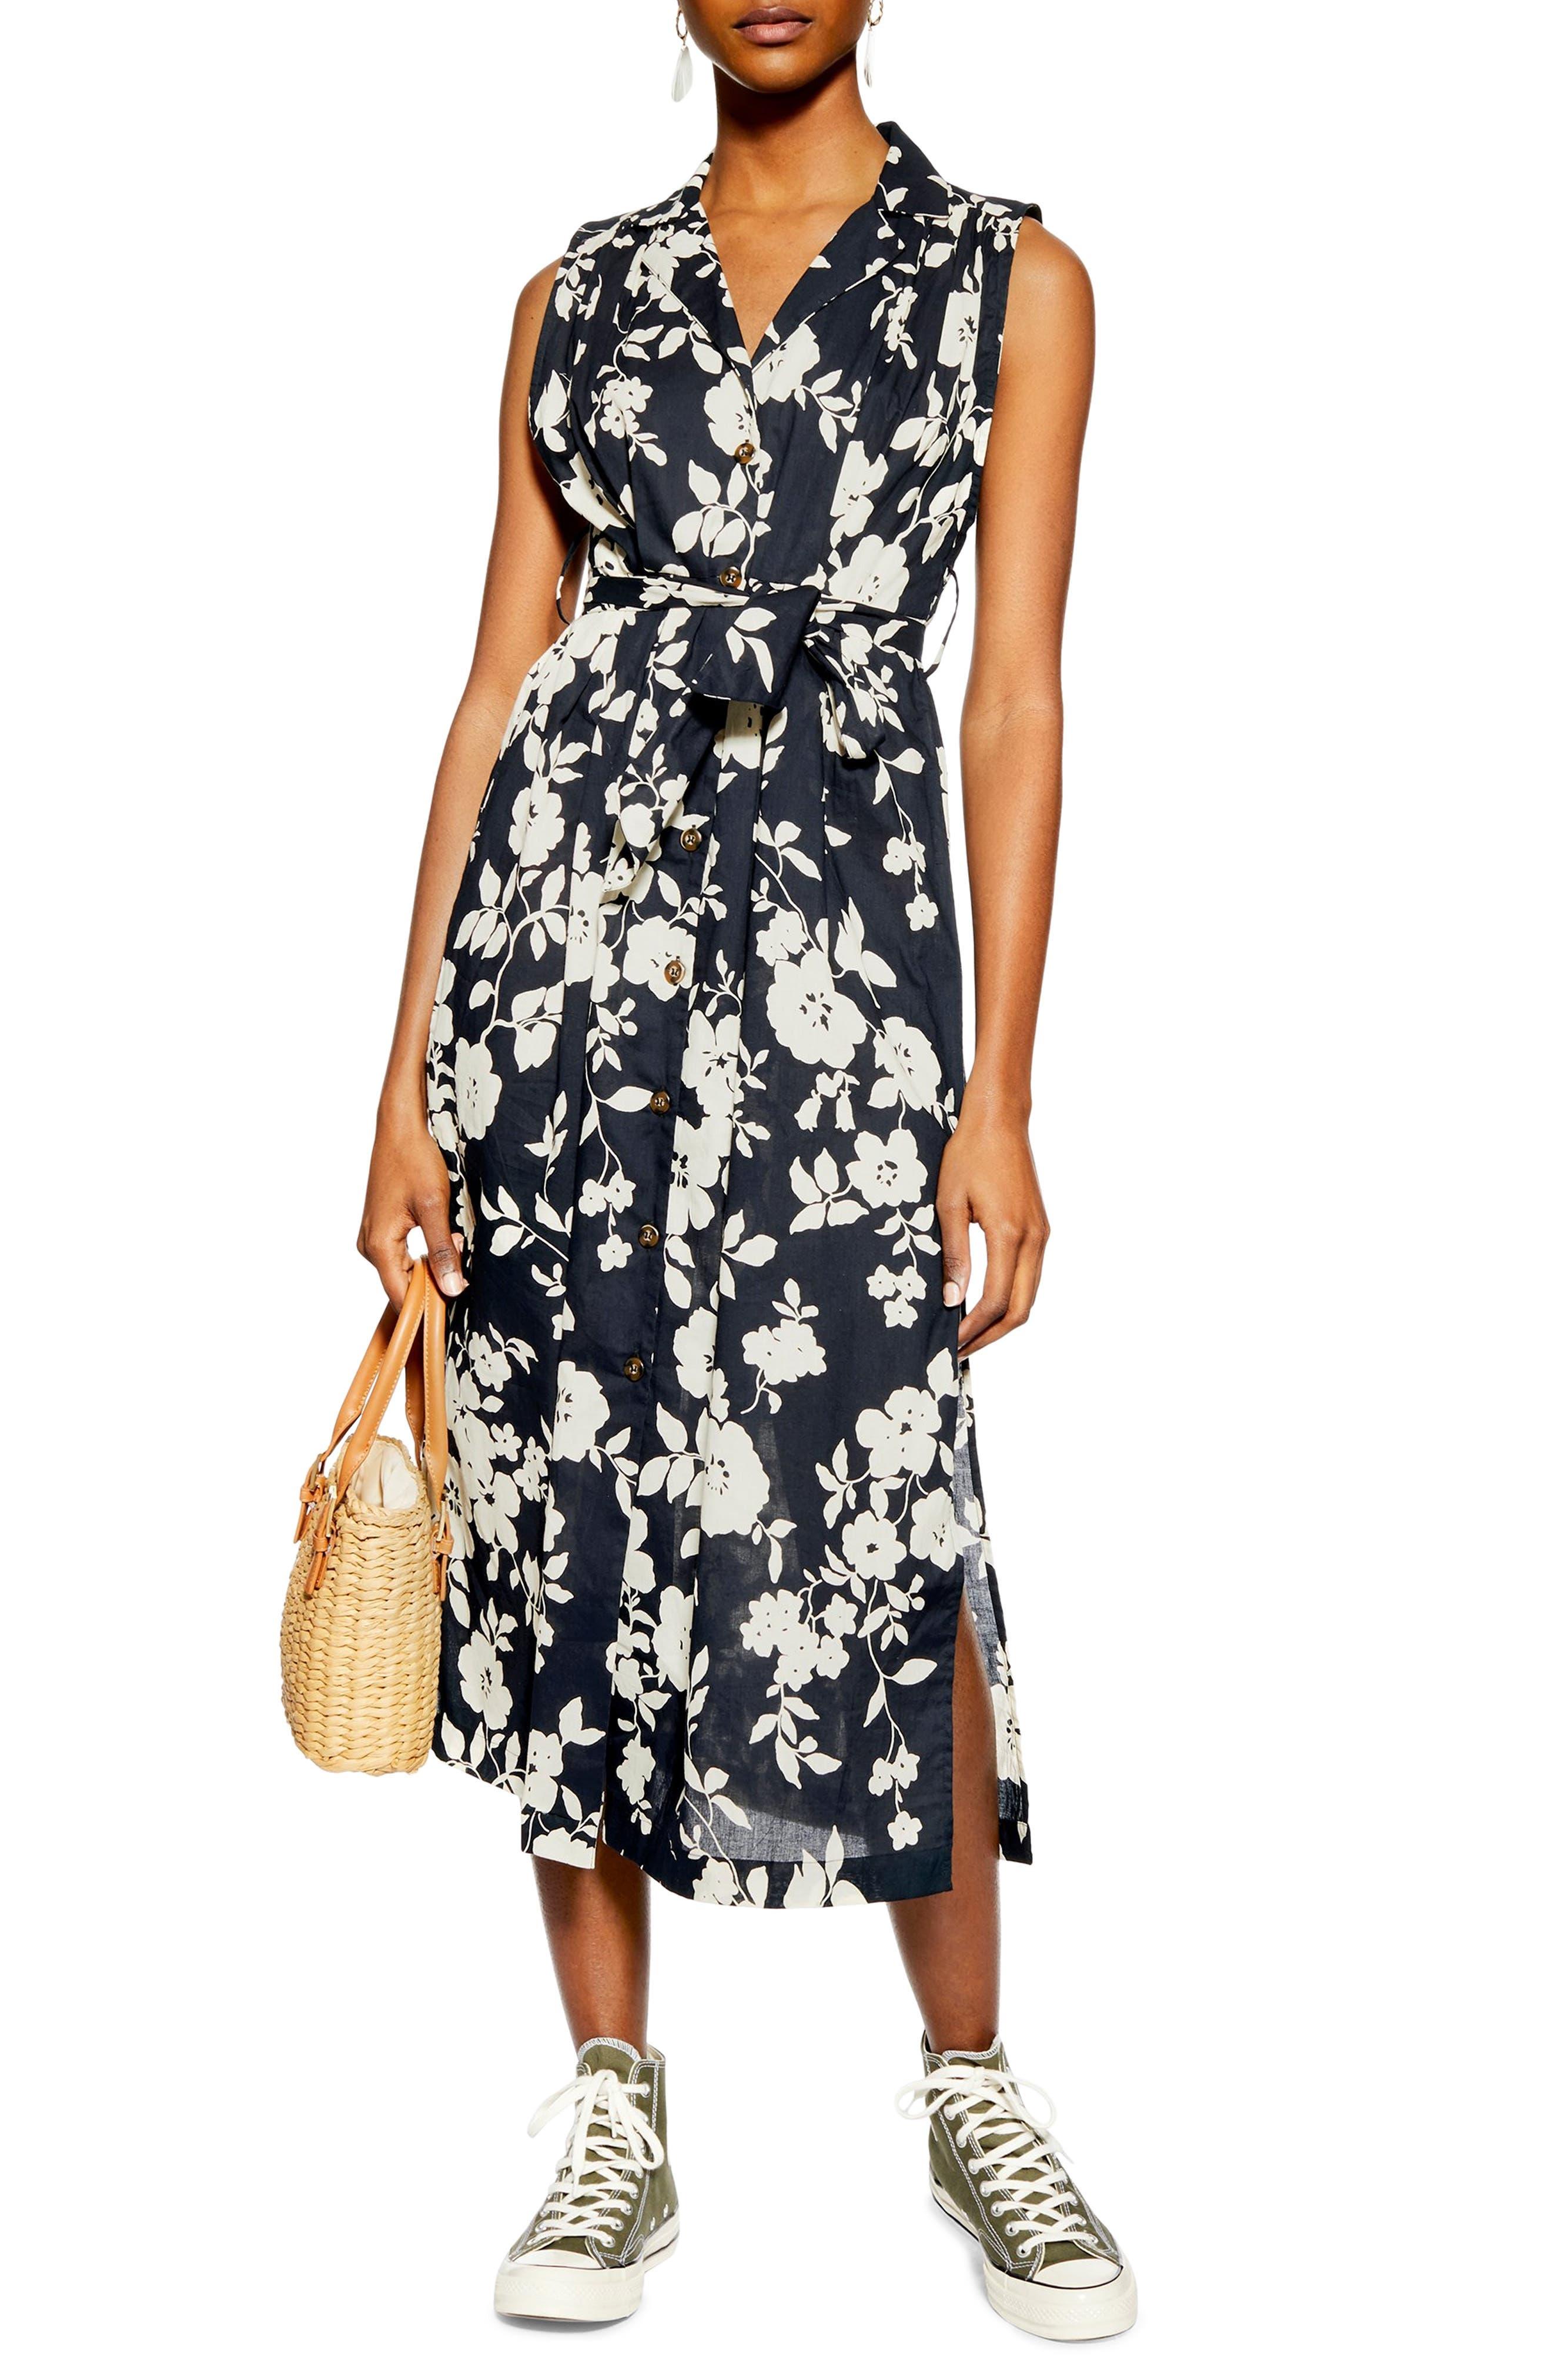 Topshop Sleeveless Midi Shirtdress, US (fits like 6-8) - Ivory